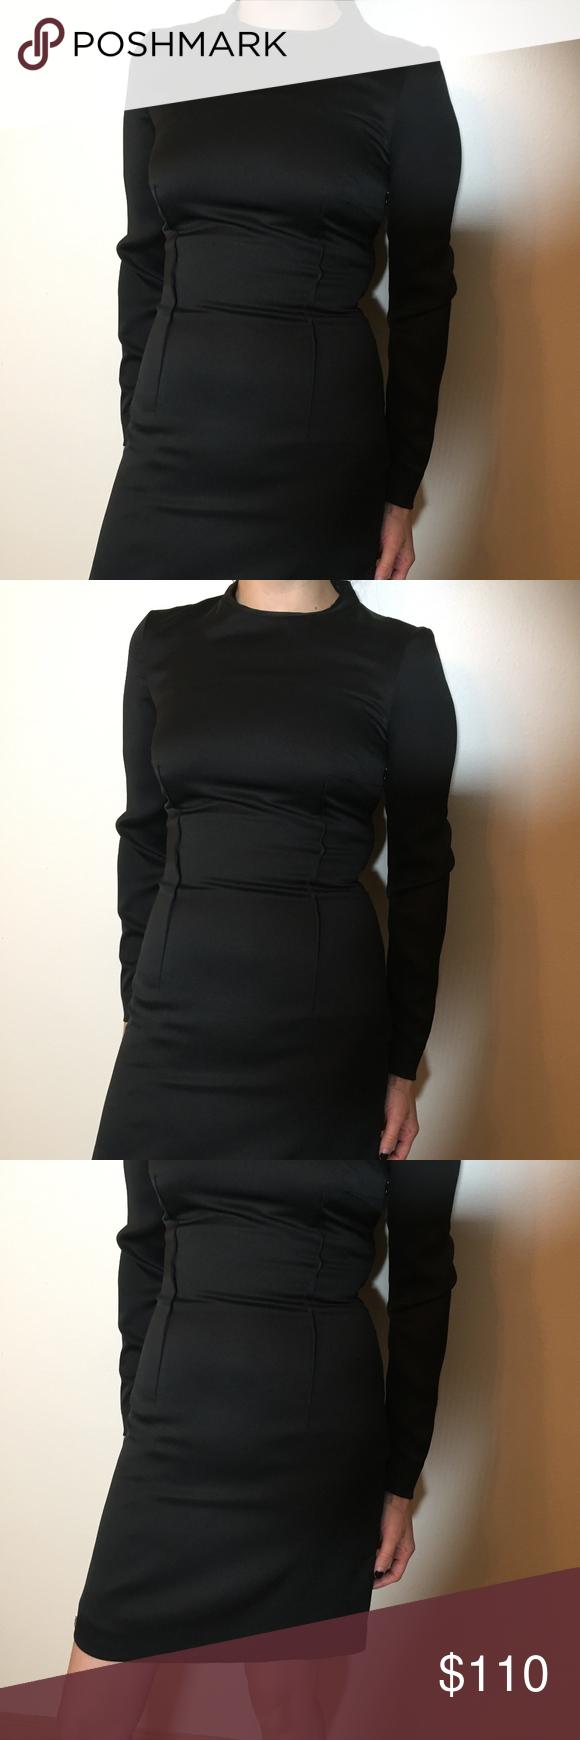 Long sleeve black dress snug fit satin finish and reiss